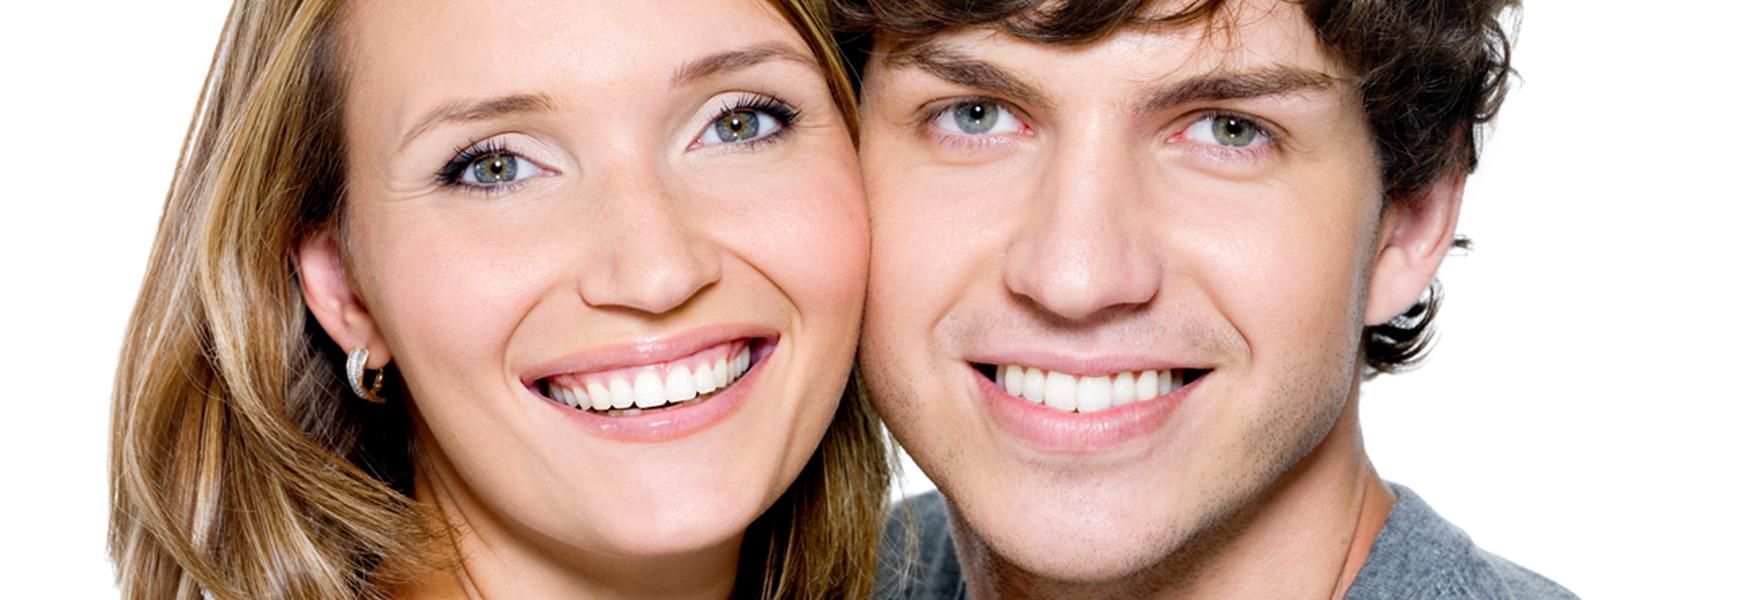 Mejores Implantes dentales en Zarautz